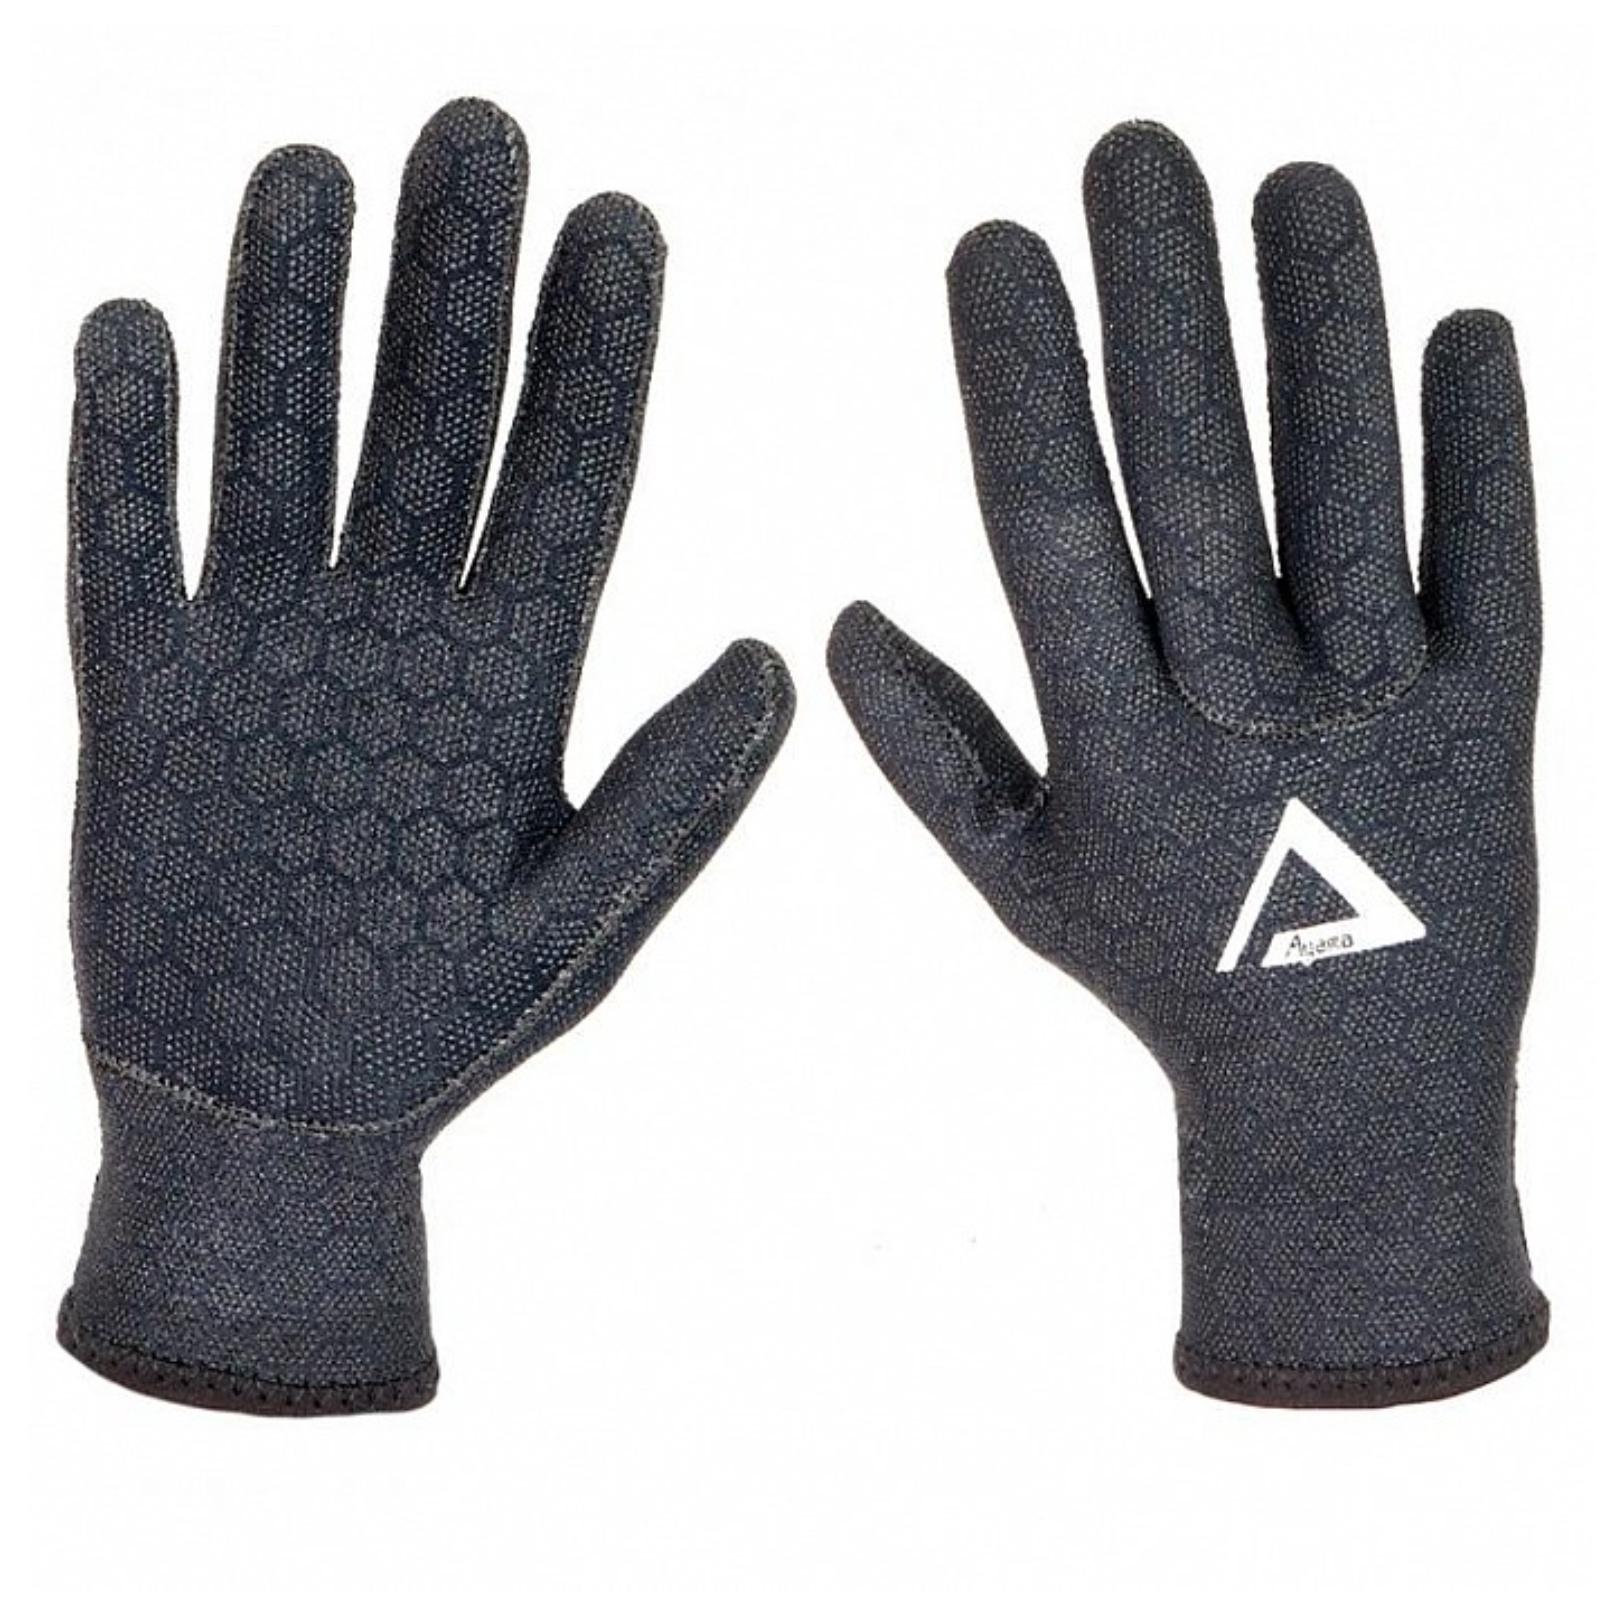 Neoprenové rukavice AGAMA Superstretch 1,5 mm - vel. S